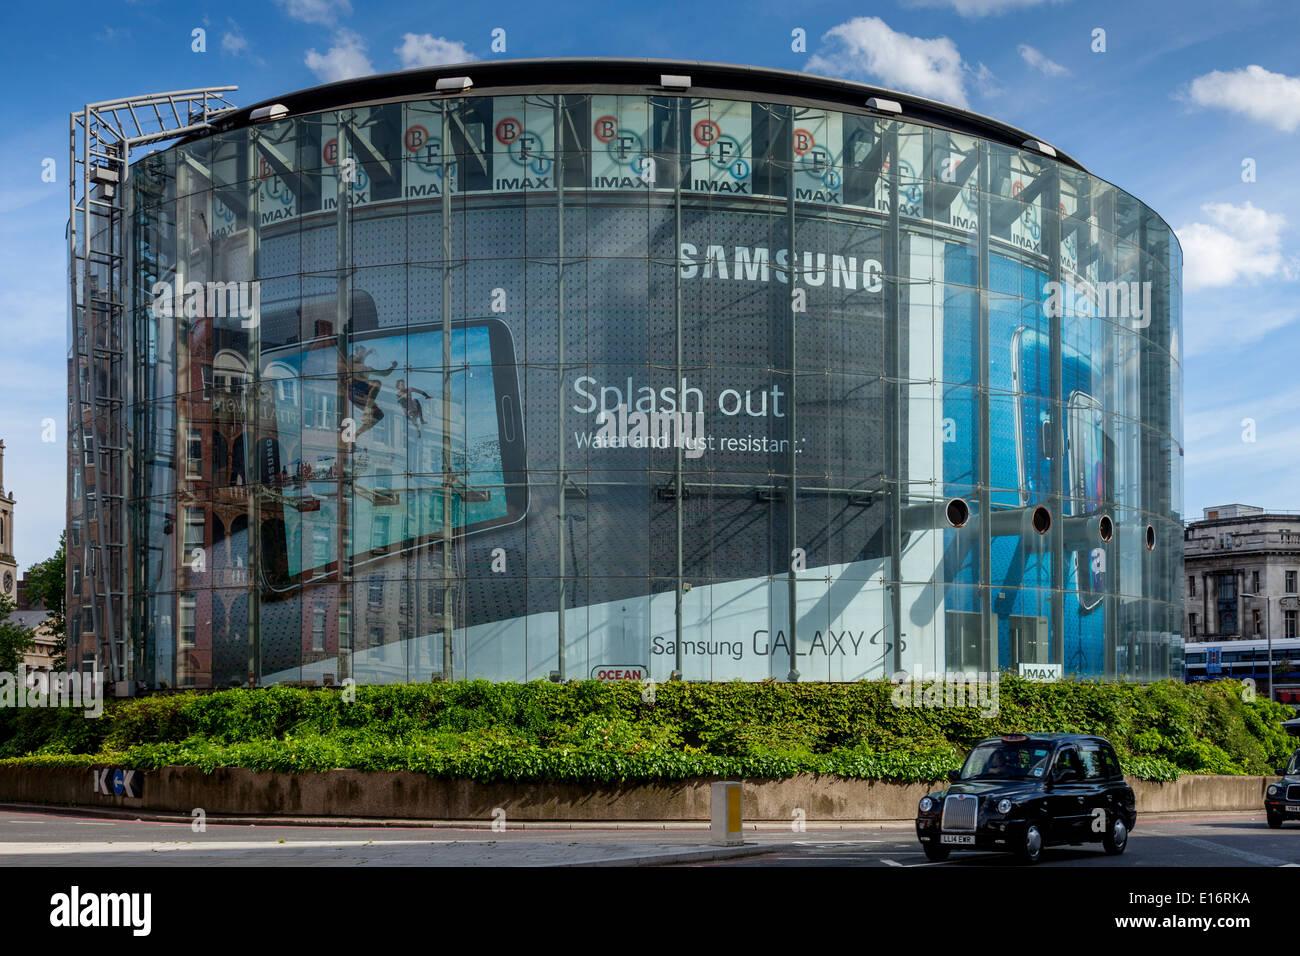 Das BFI IMAX Kino, London, England Stockbild